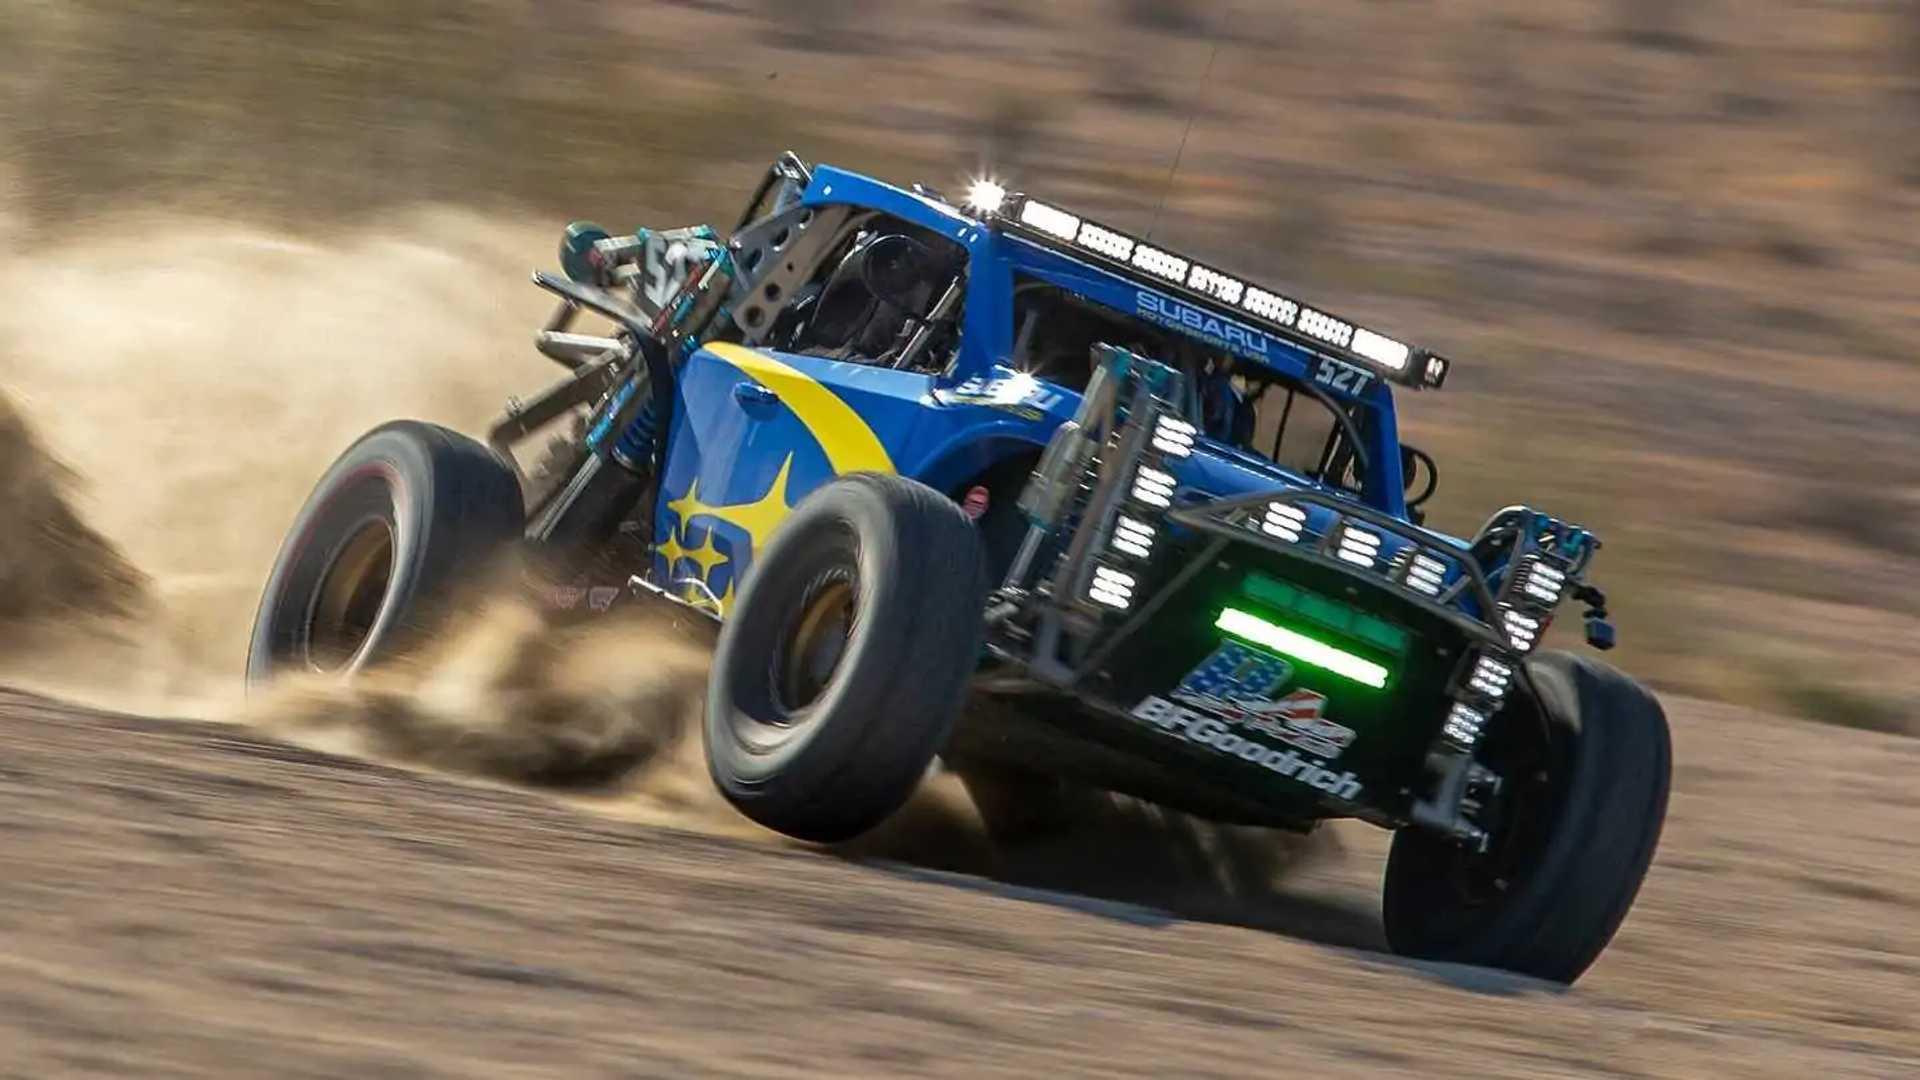 Subaru Crosstrek Desert Racer Looks Ready To Beat Baja